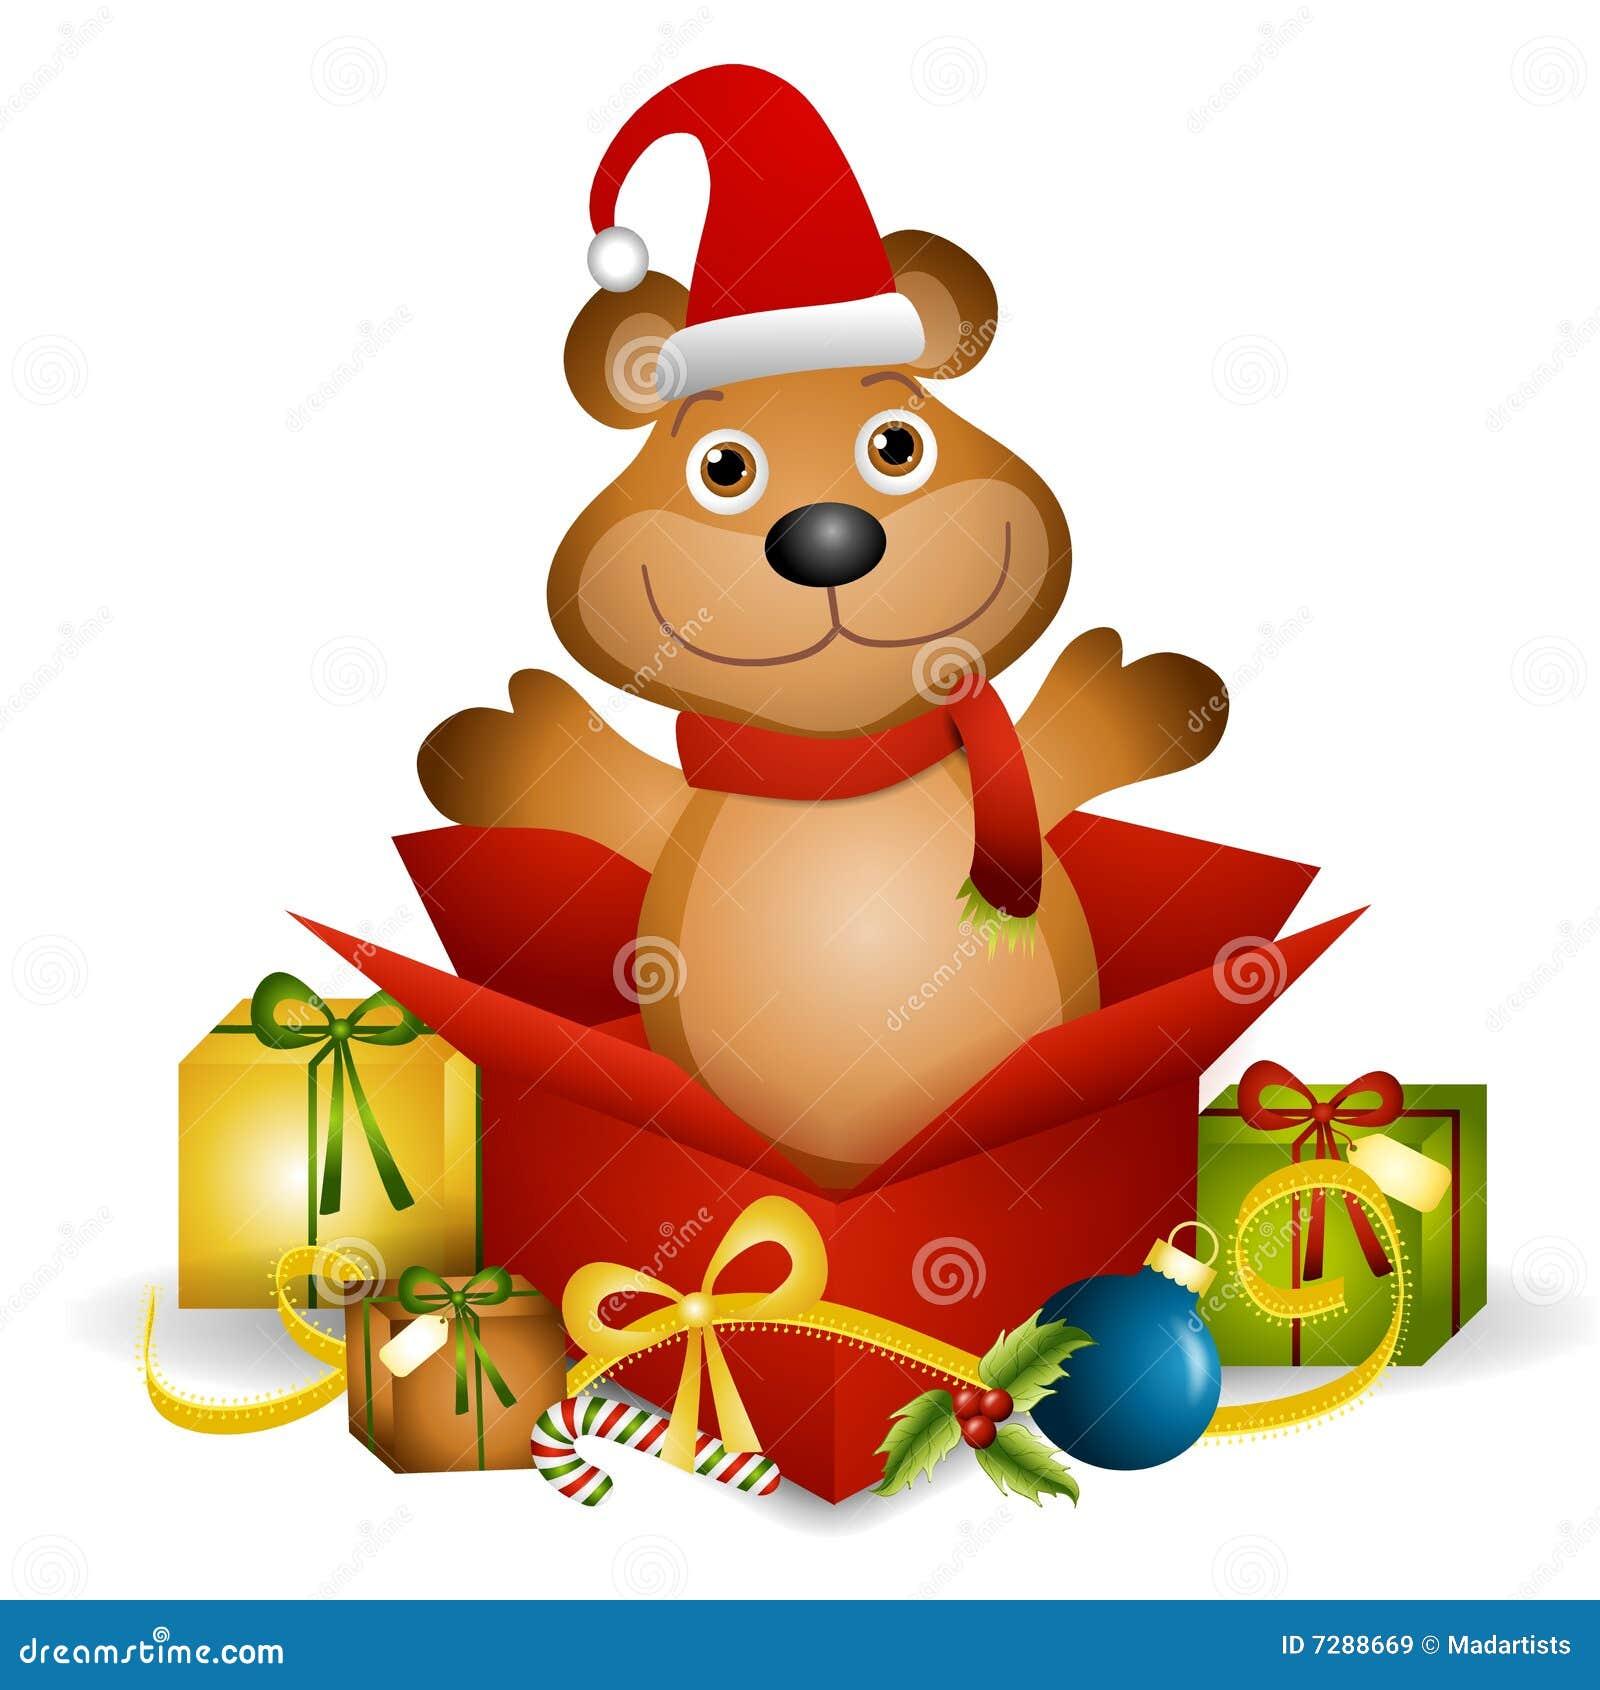 Teddy Bear Xmas Gift Royalty Free Stock Images Image